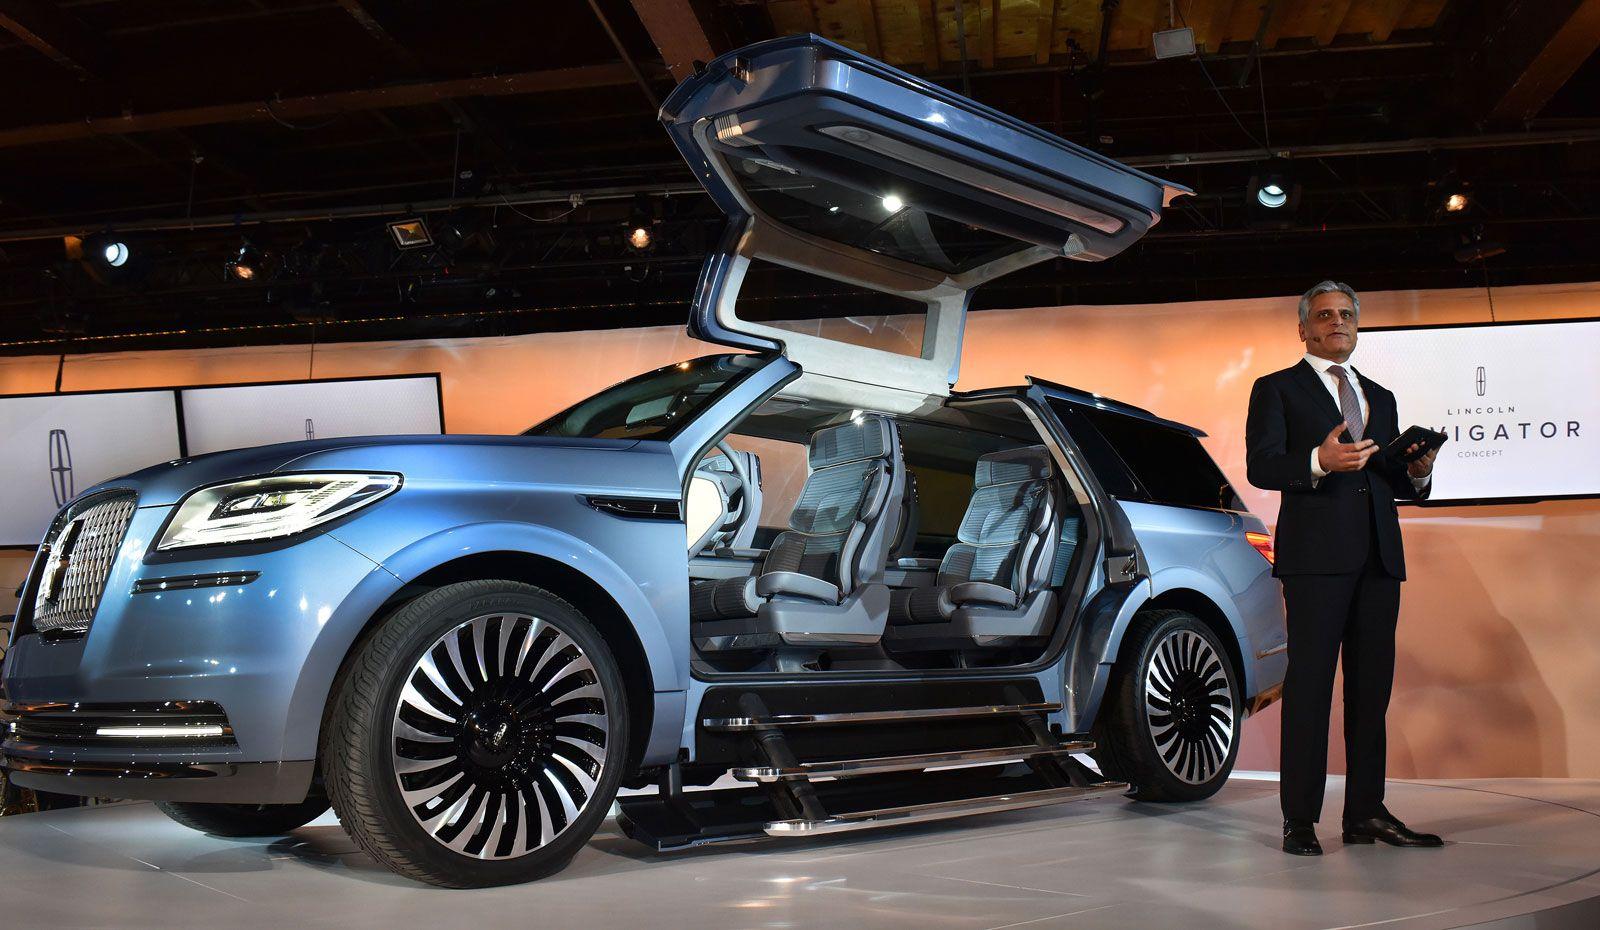 luxury lincoln navigator concept release date martocciautomotive com